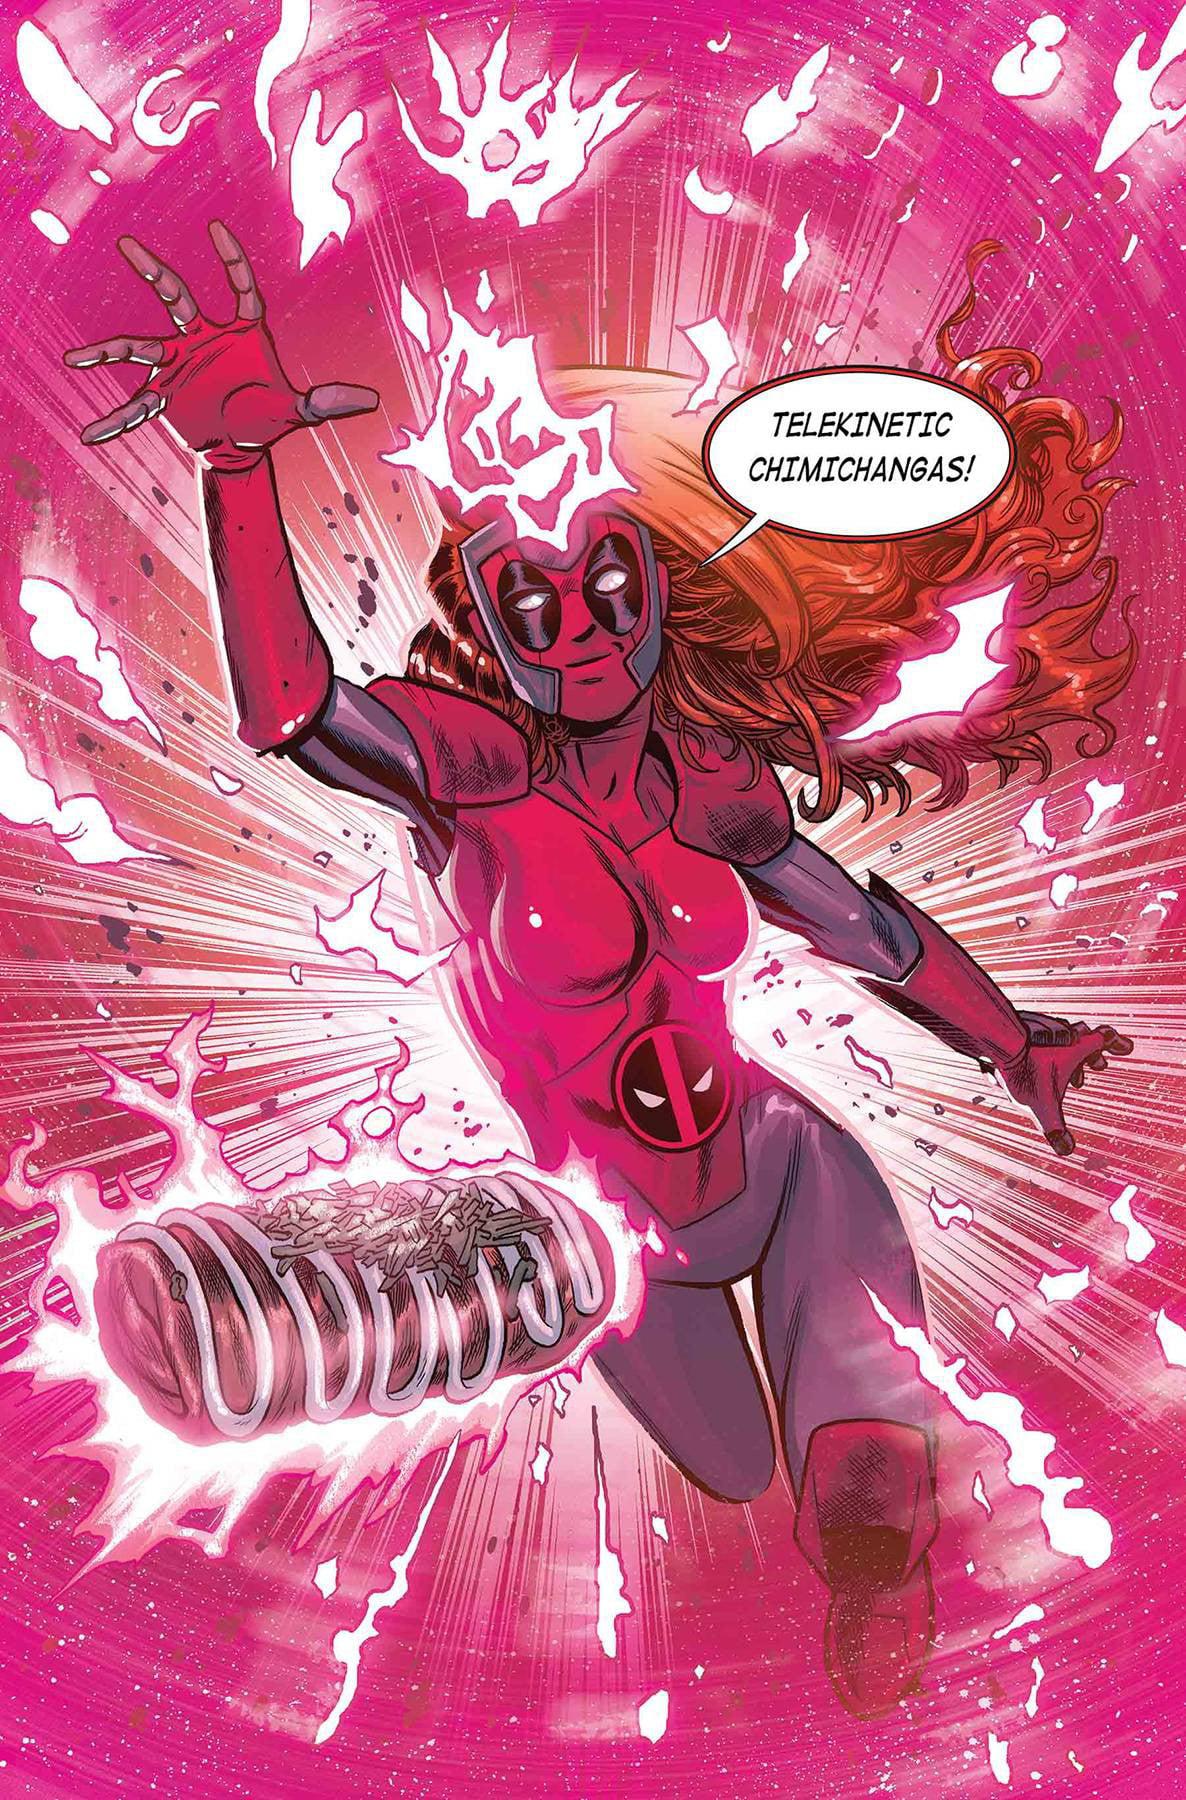 Marvel X-Men Red #4 [Schoonover Deadpool Variant] by